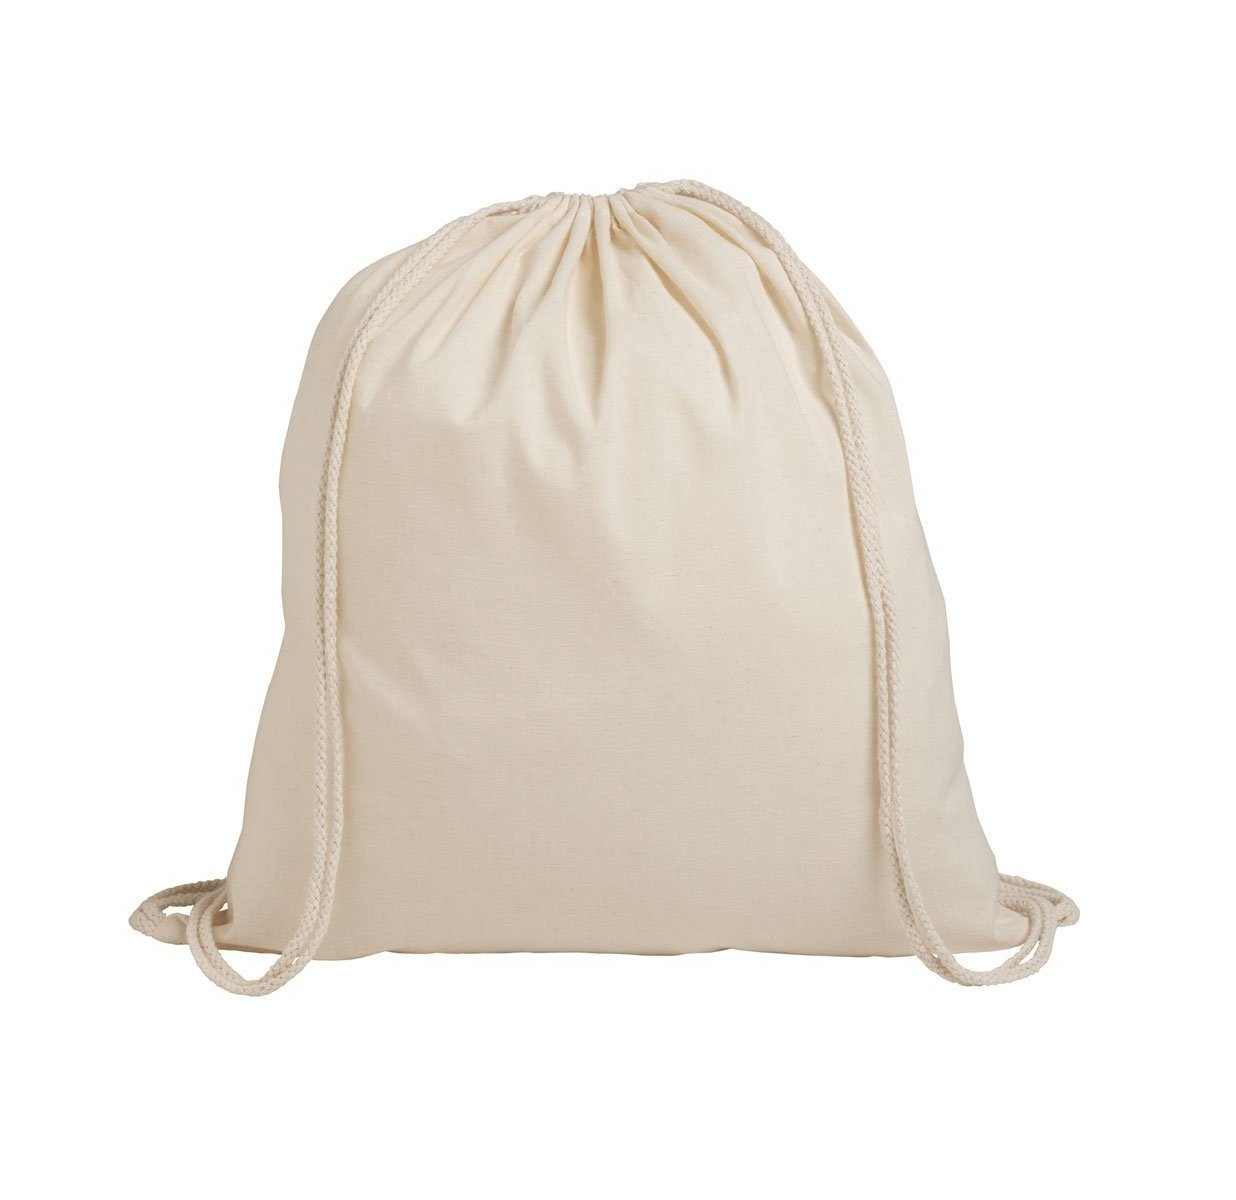 Buy BALANG Unisex Oxford Cloth Trekking Rucksacks/School